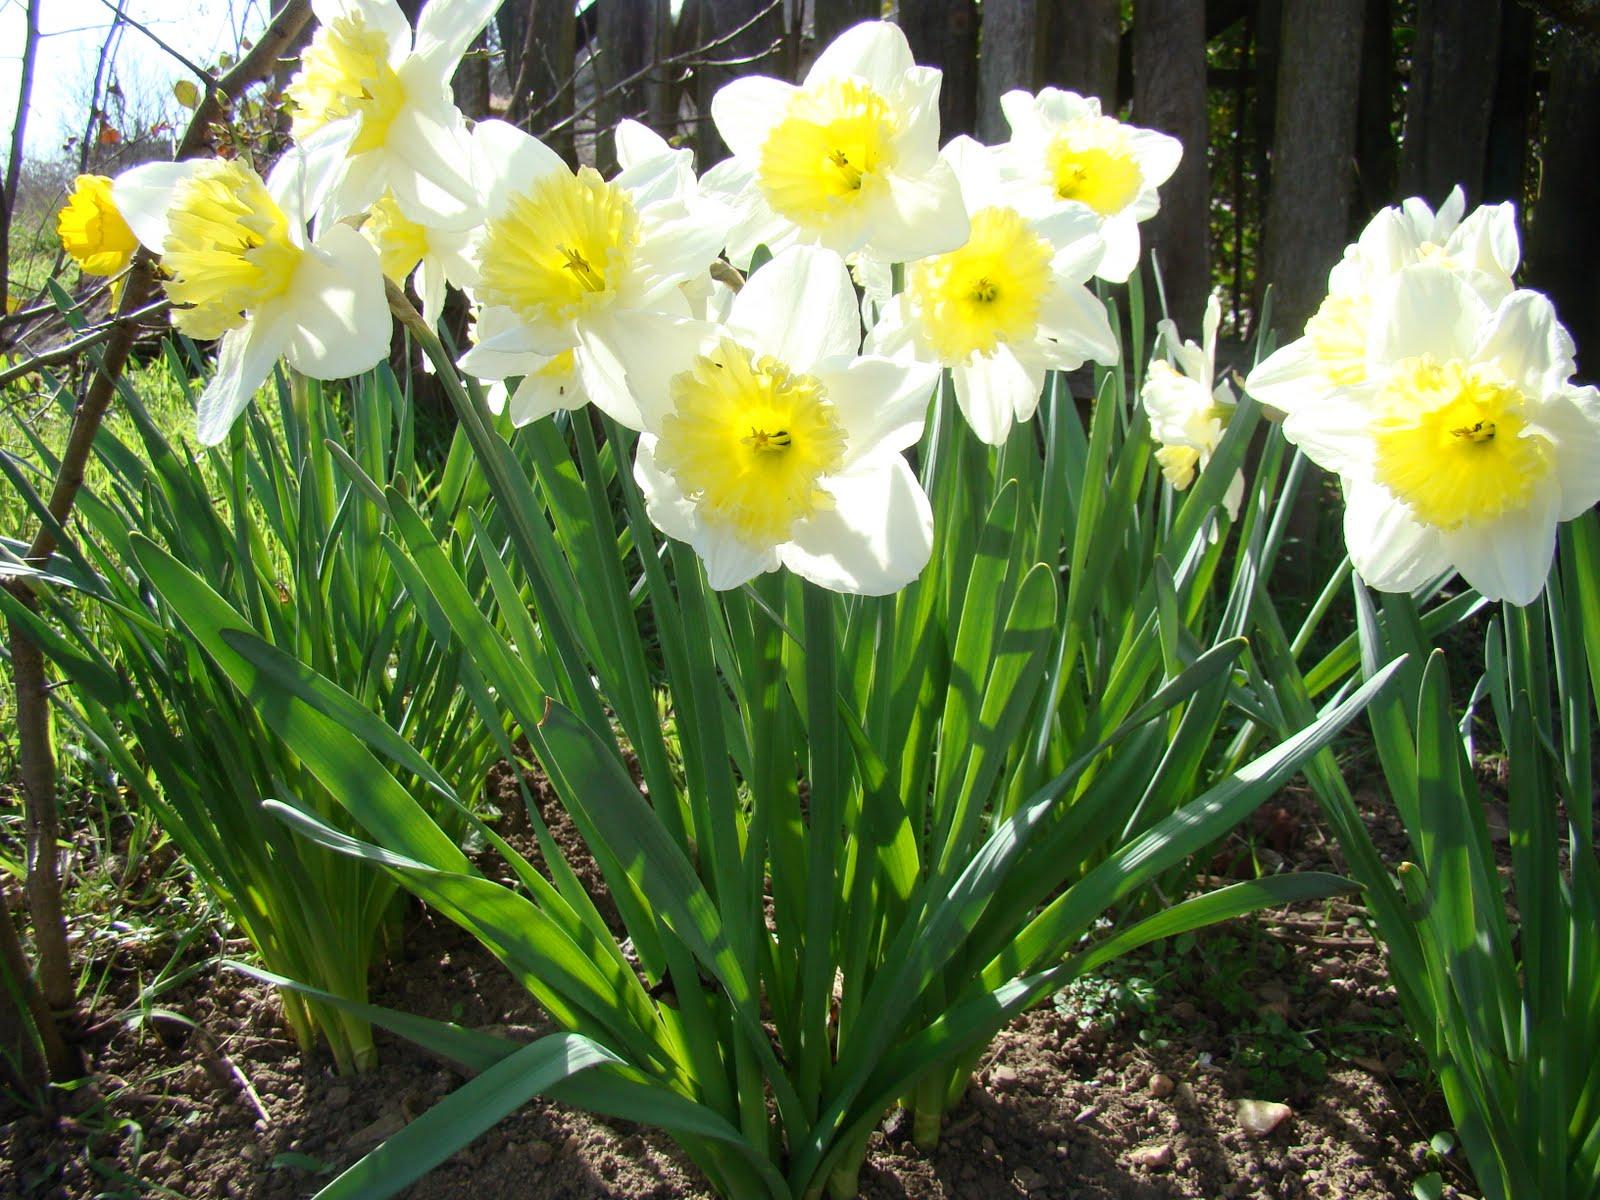 Le jardin de catherine enfin le printemps for Jardin de catherine